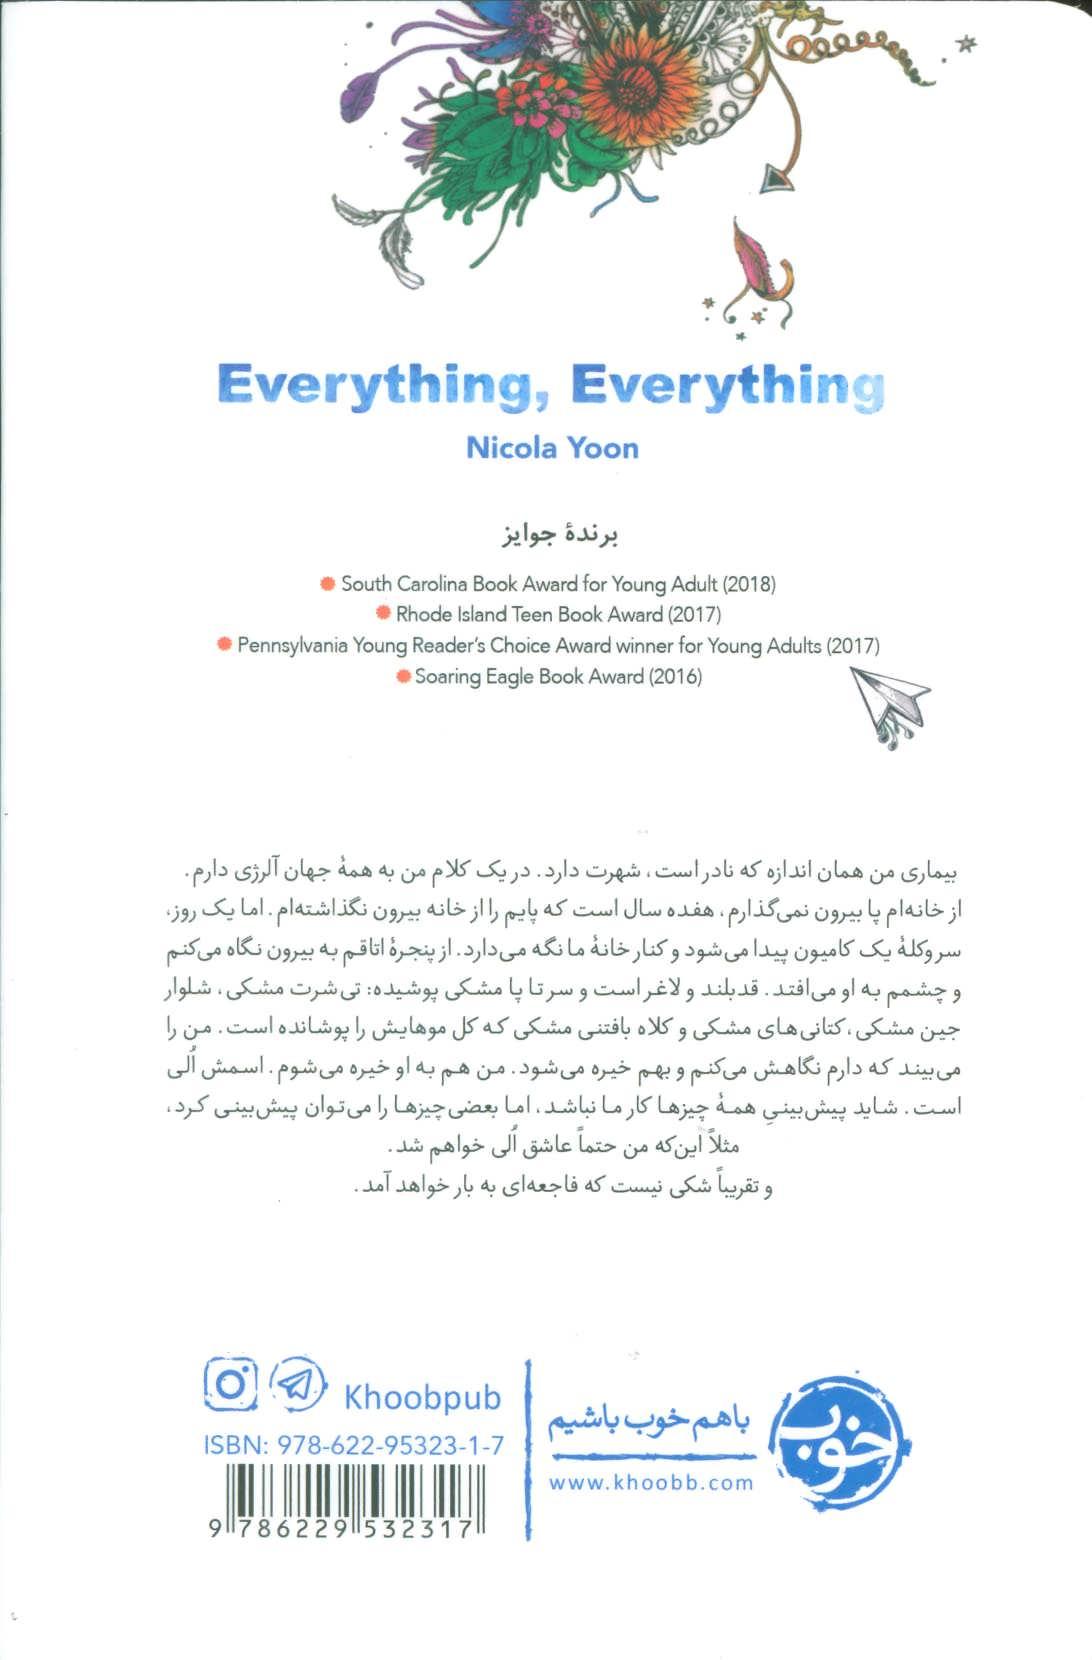 همه چیز،همه چیز